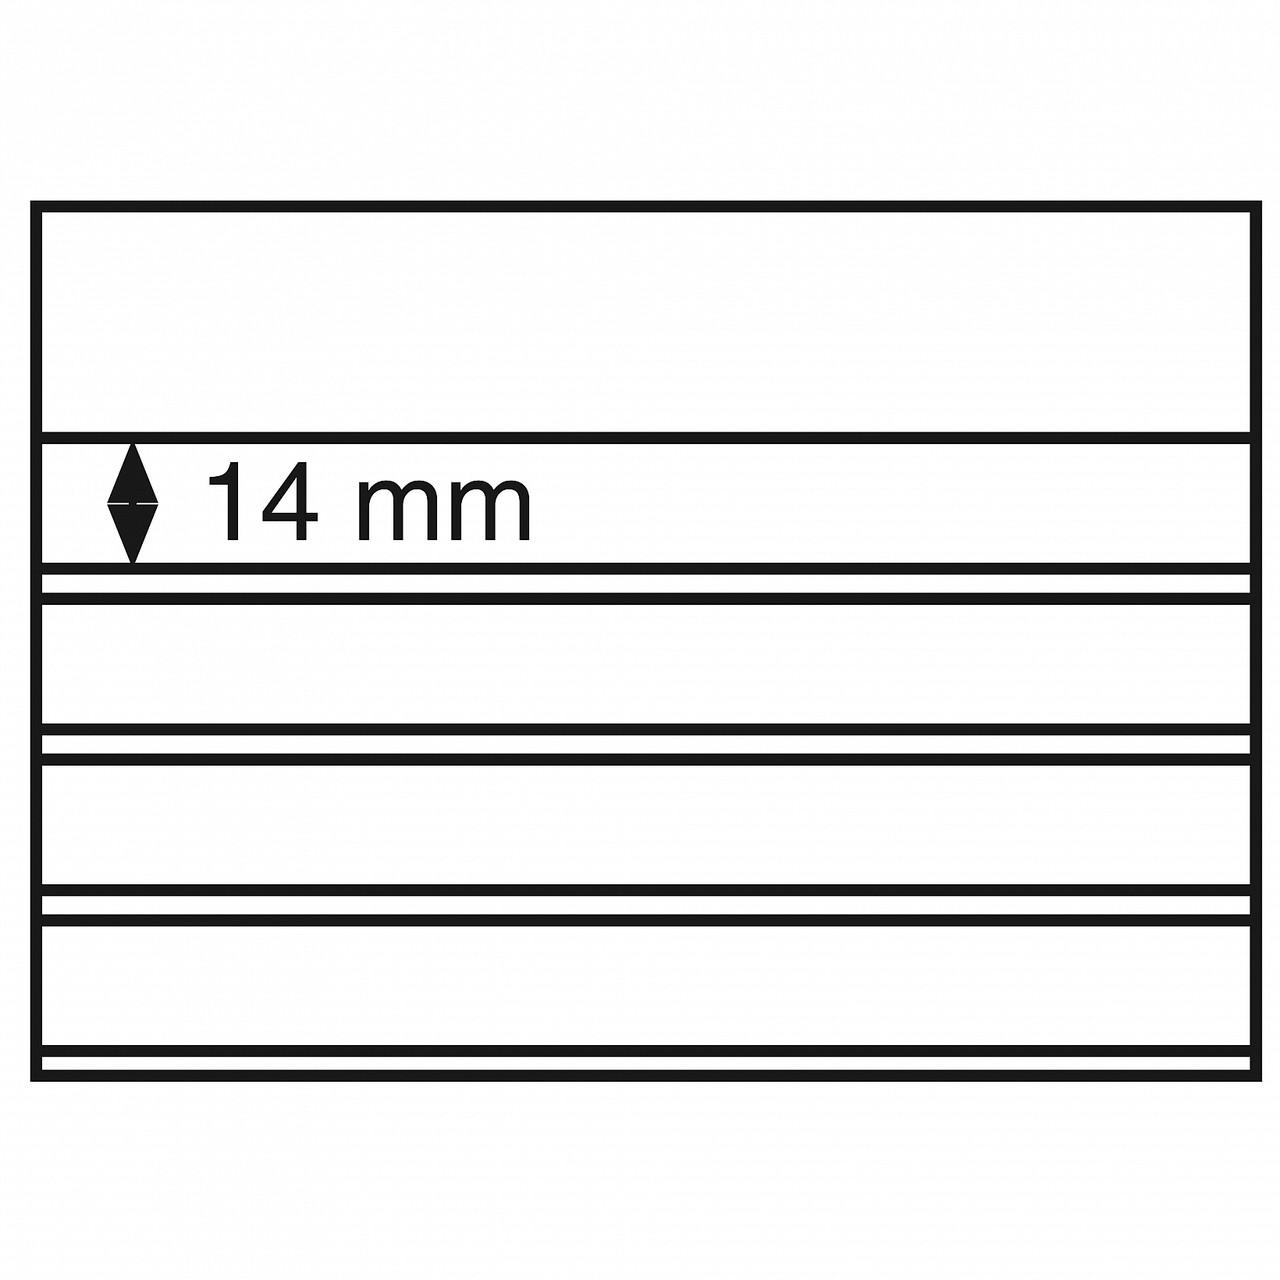 Планшет Leuchtturm, Standart (4 полоски/14мм)